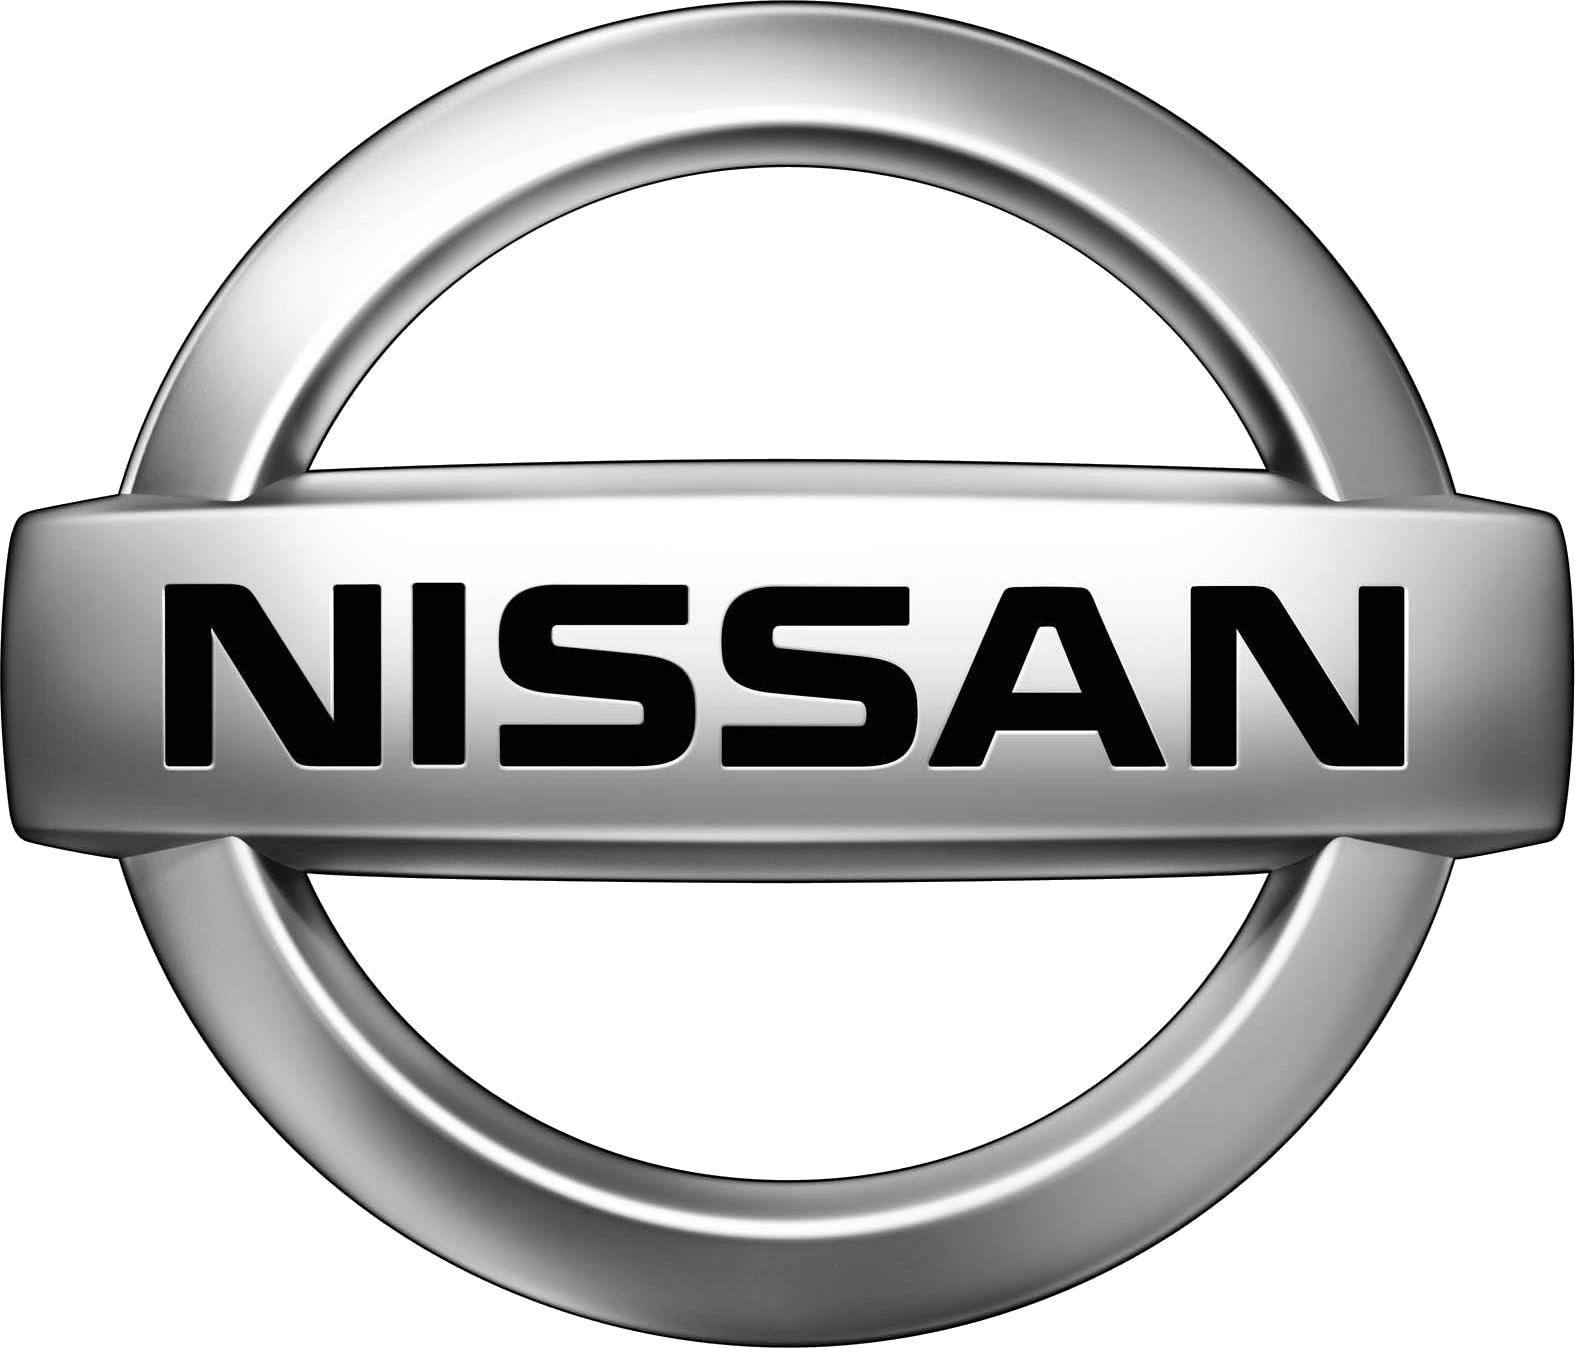 Nissan Car Logo Png Brand Image